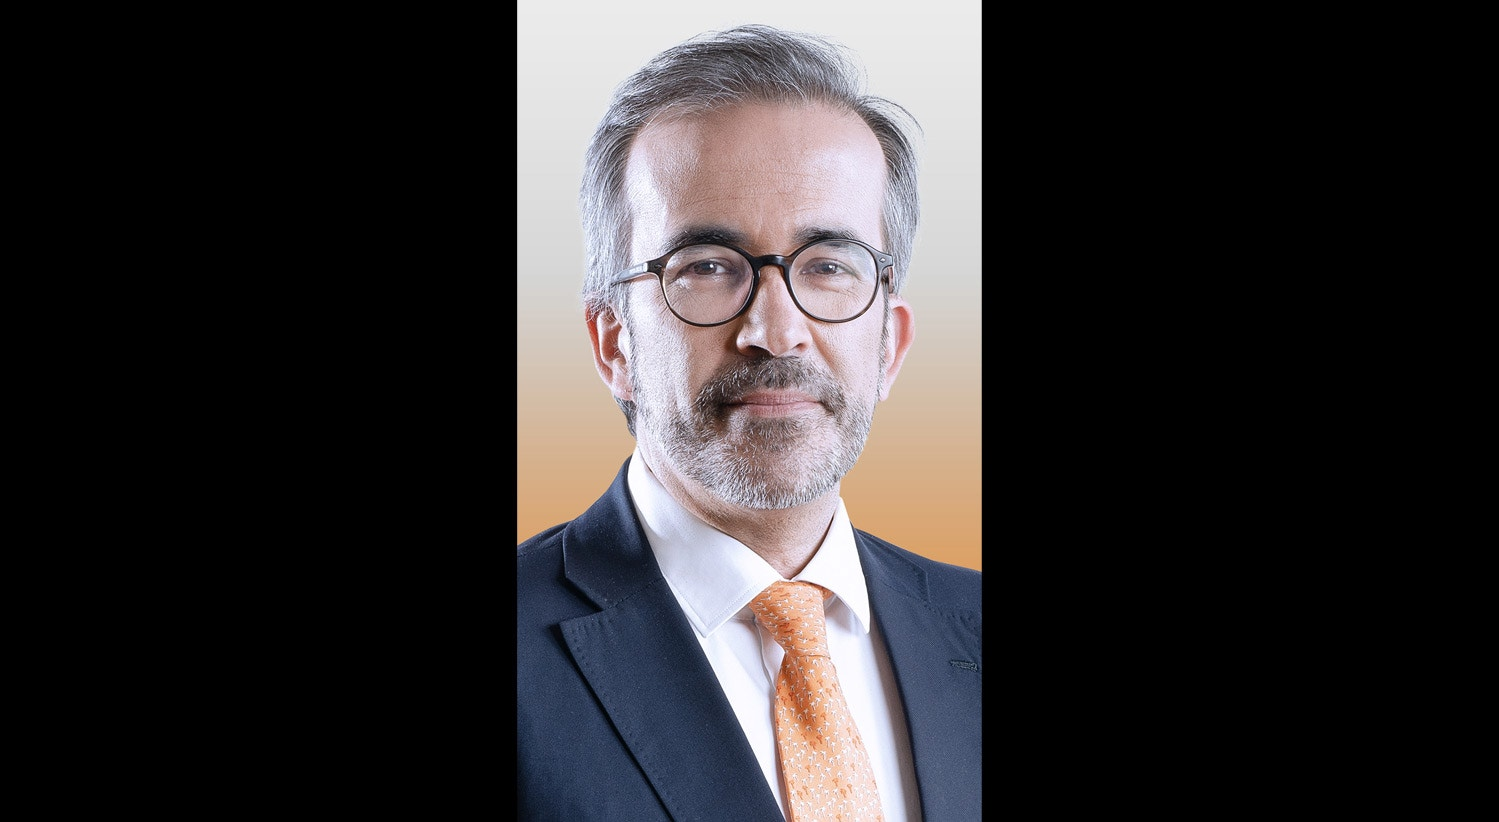 Paulo Rangel, PSD - 3.º mandato